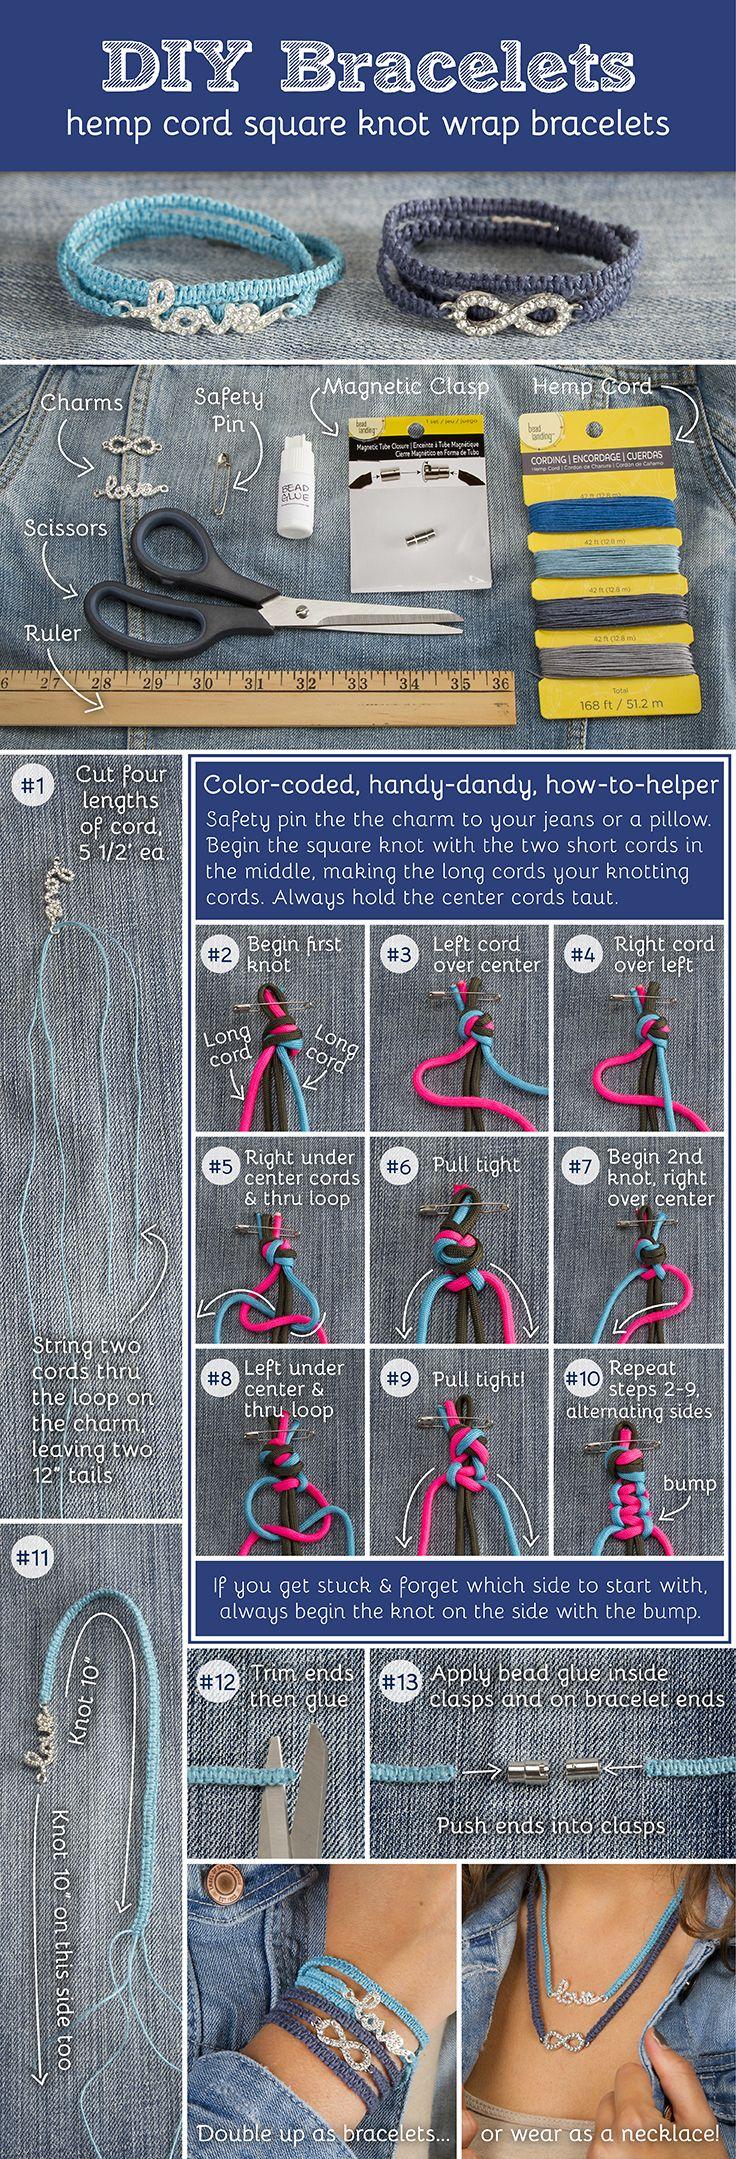 DIY Infinity Hemp Bracelet - easy to create square knot wrap bracelets